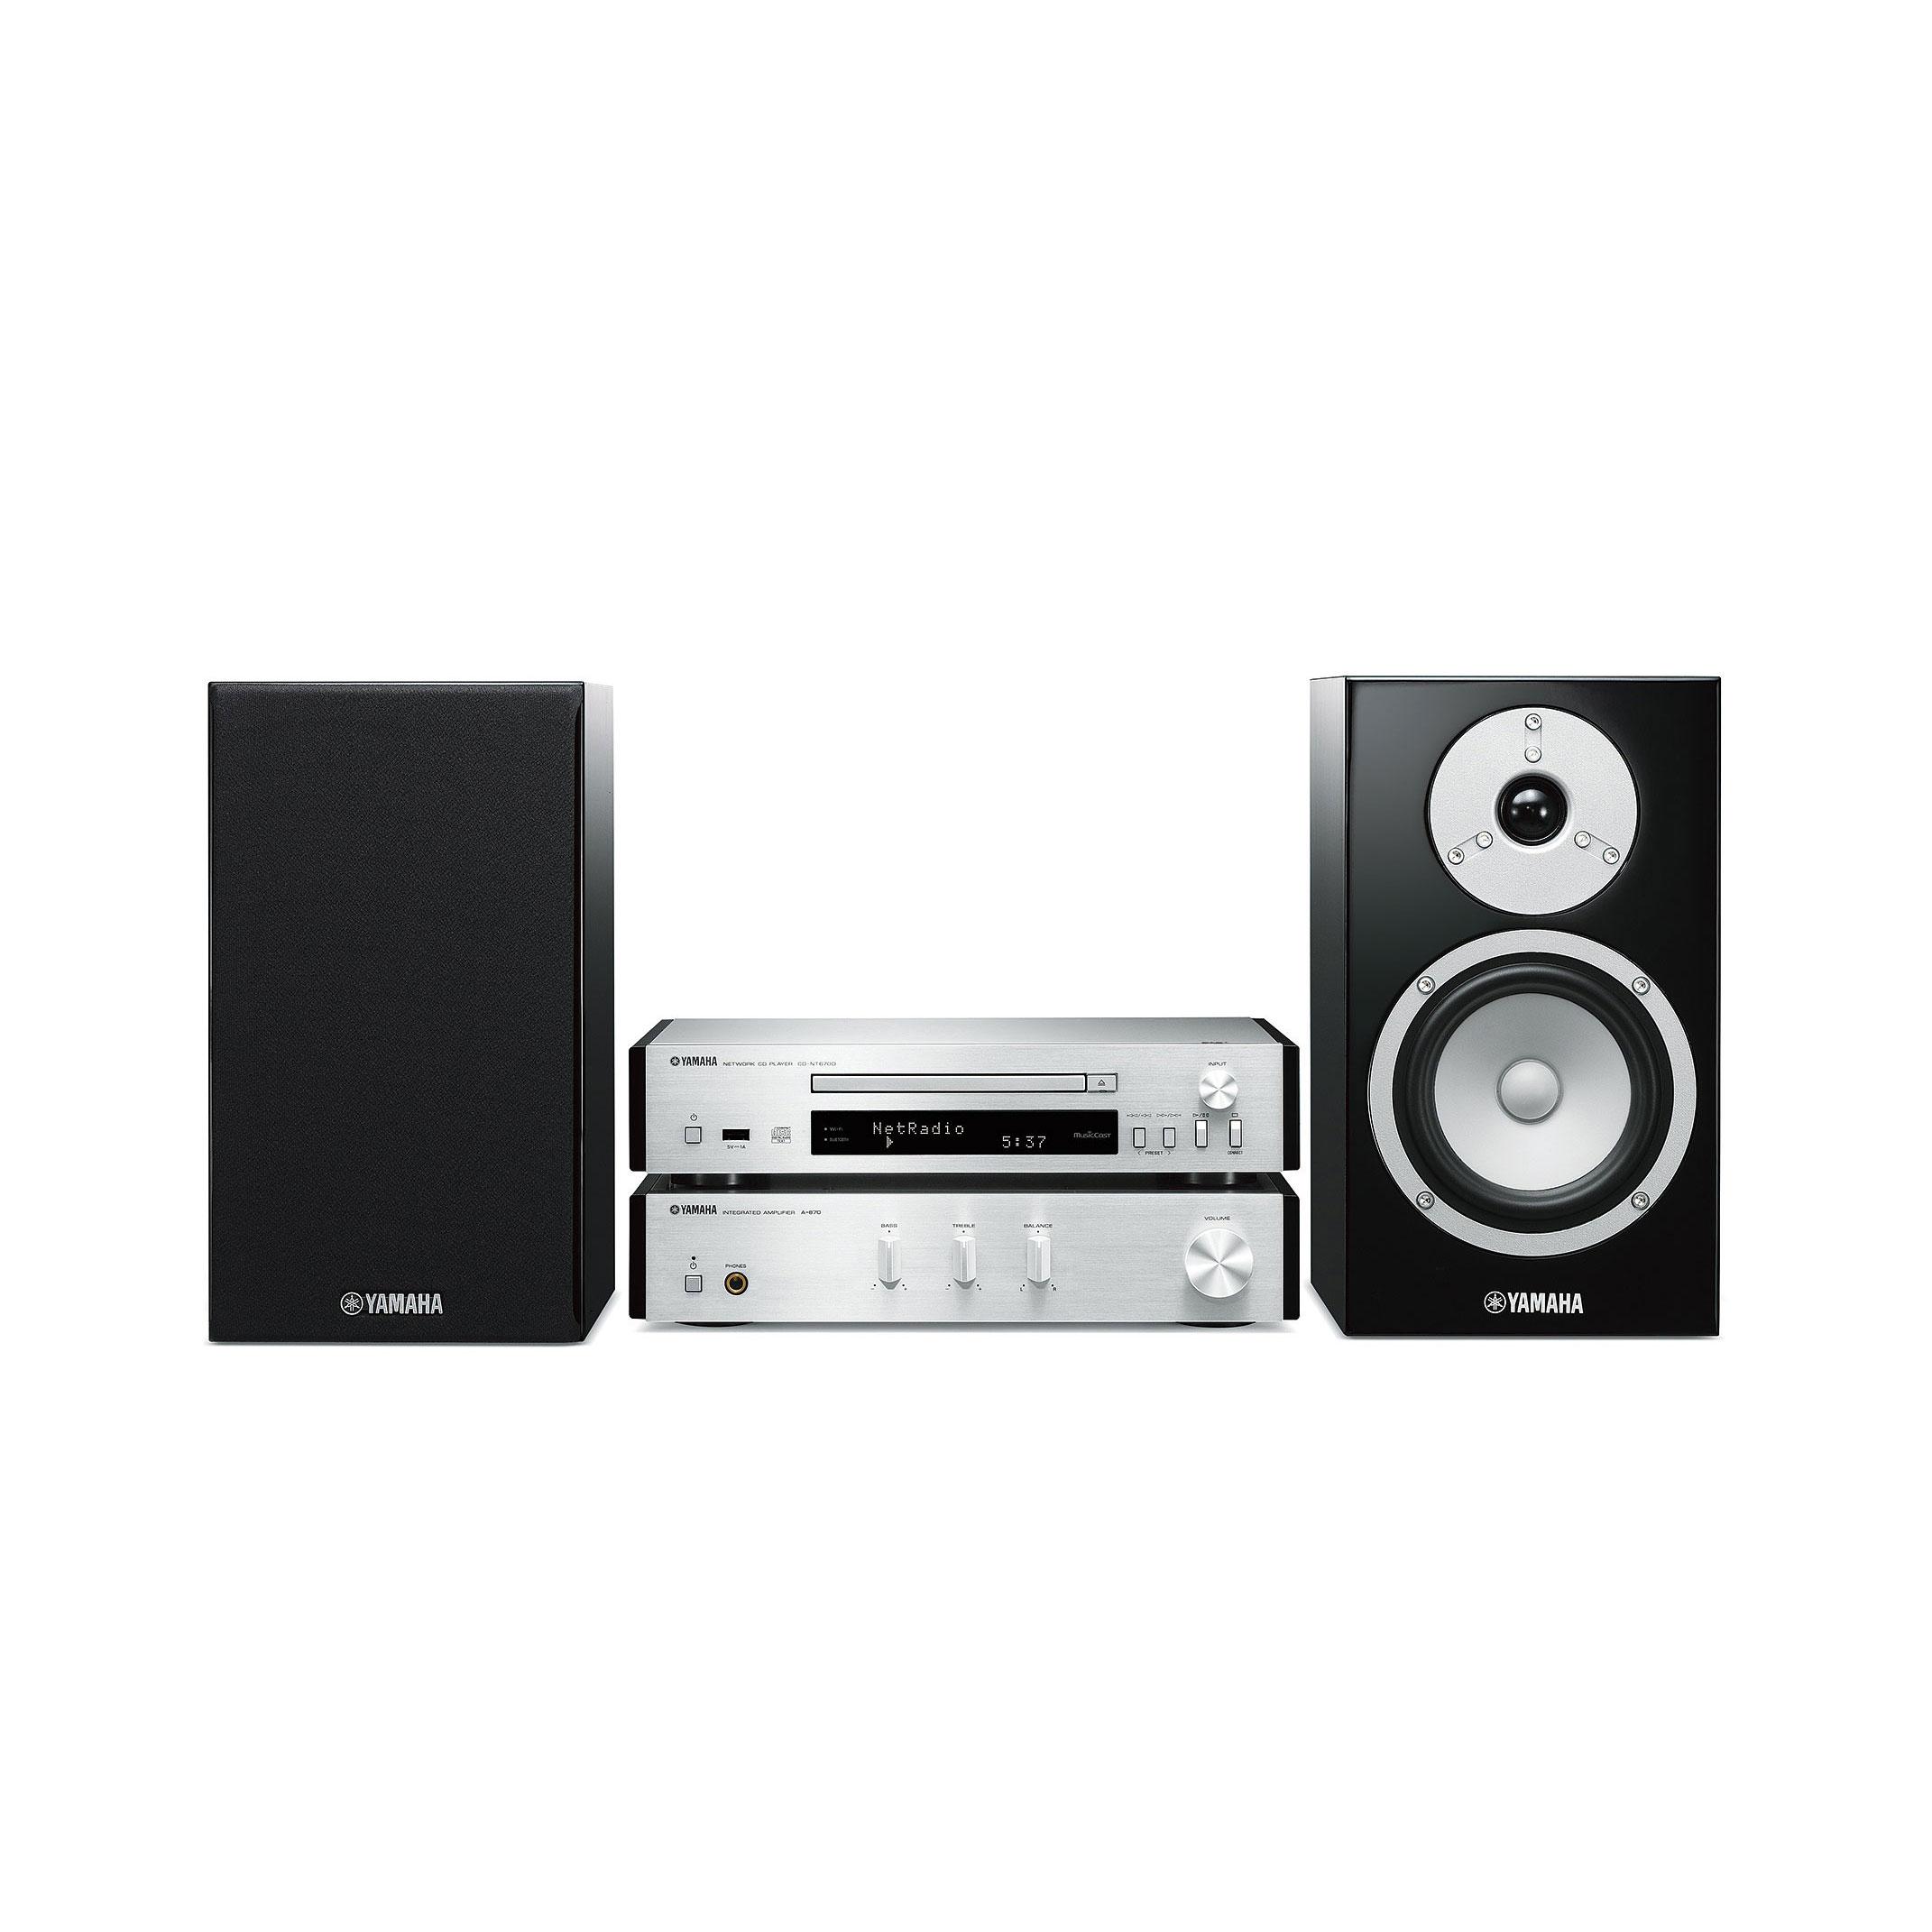 Yamaha MusicCast MCR-N670D Mini System